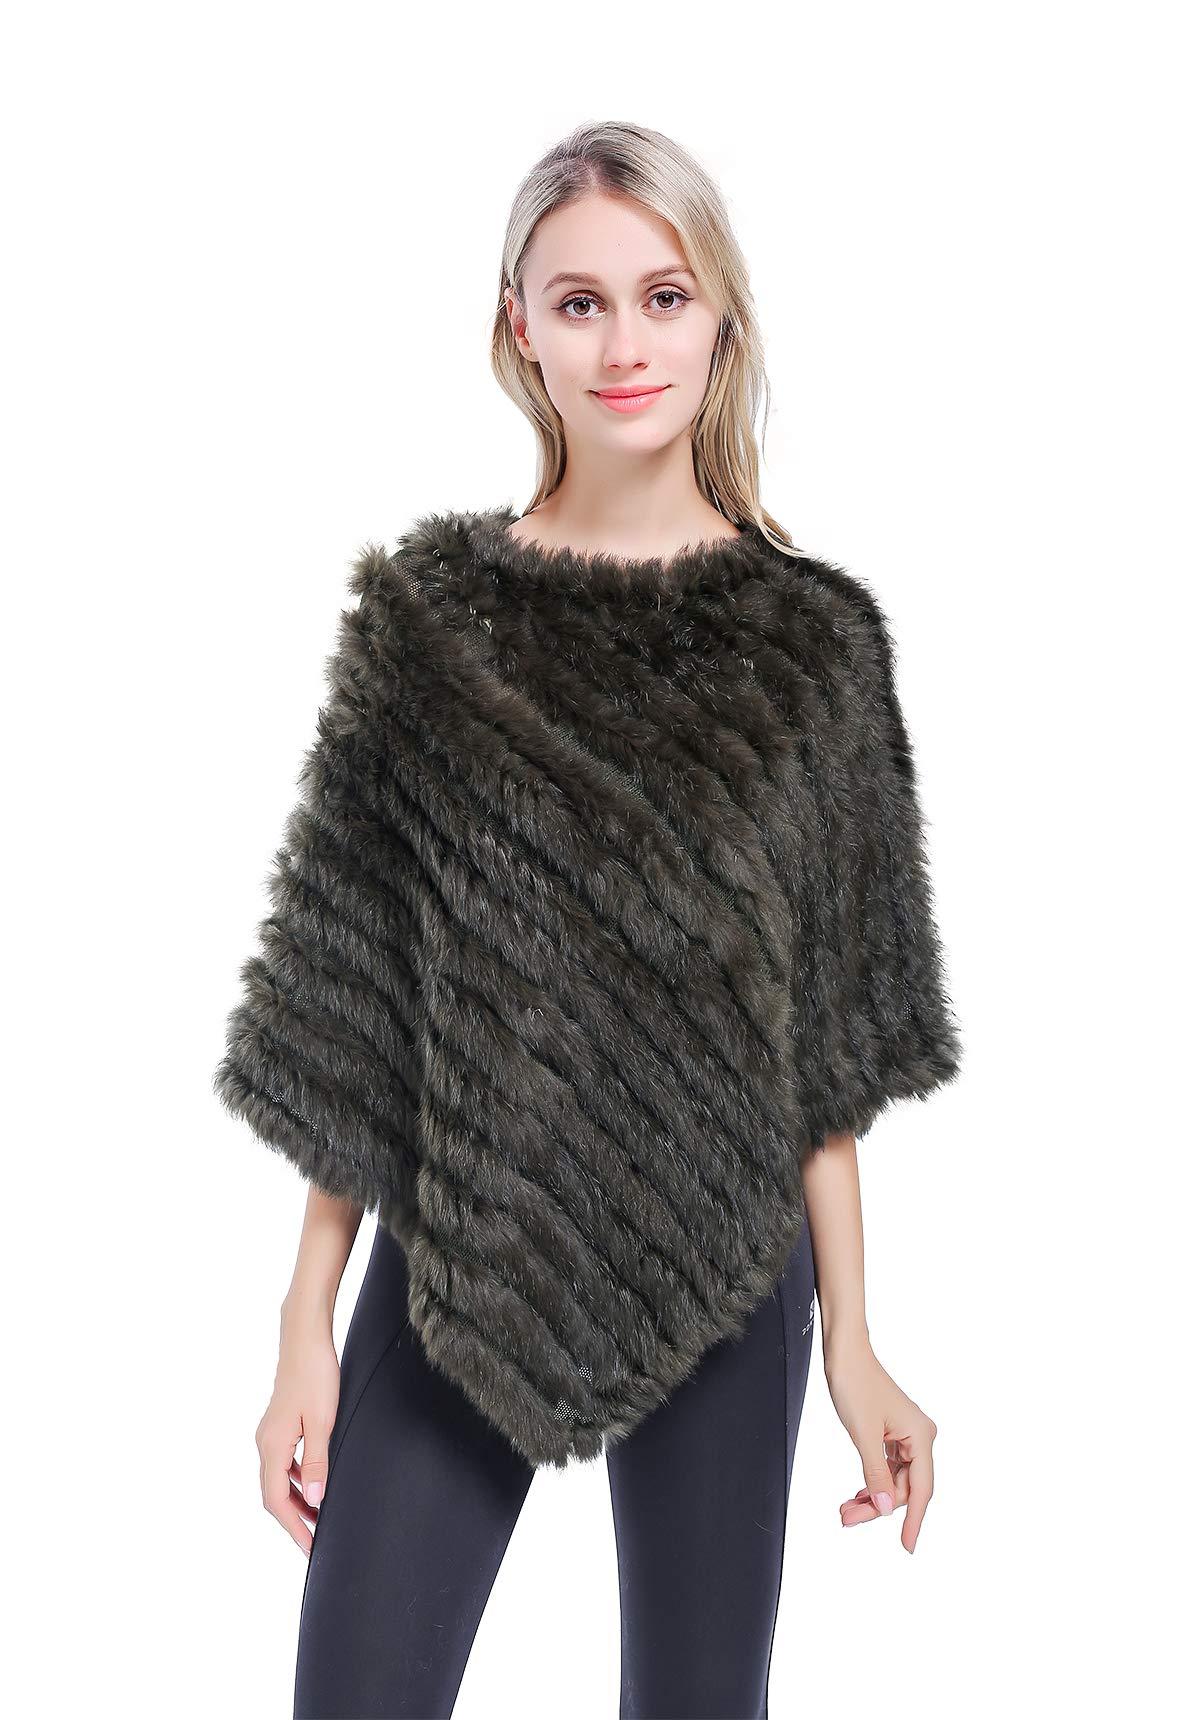 MEEFUR Real Rabbit Fur Shawls Women's Warm Knitted Genuine Fur Ponchos Jacket Blanket Cape for Winter